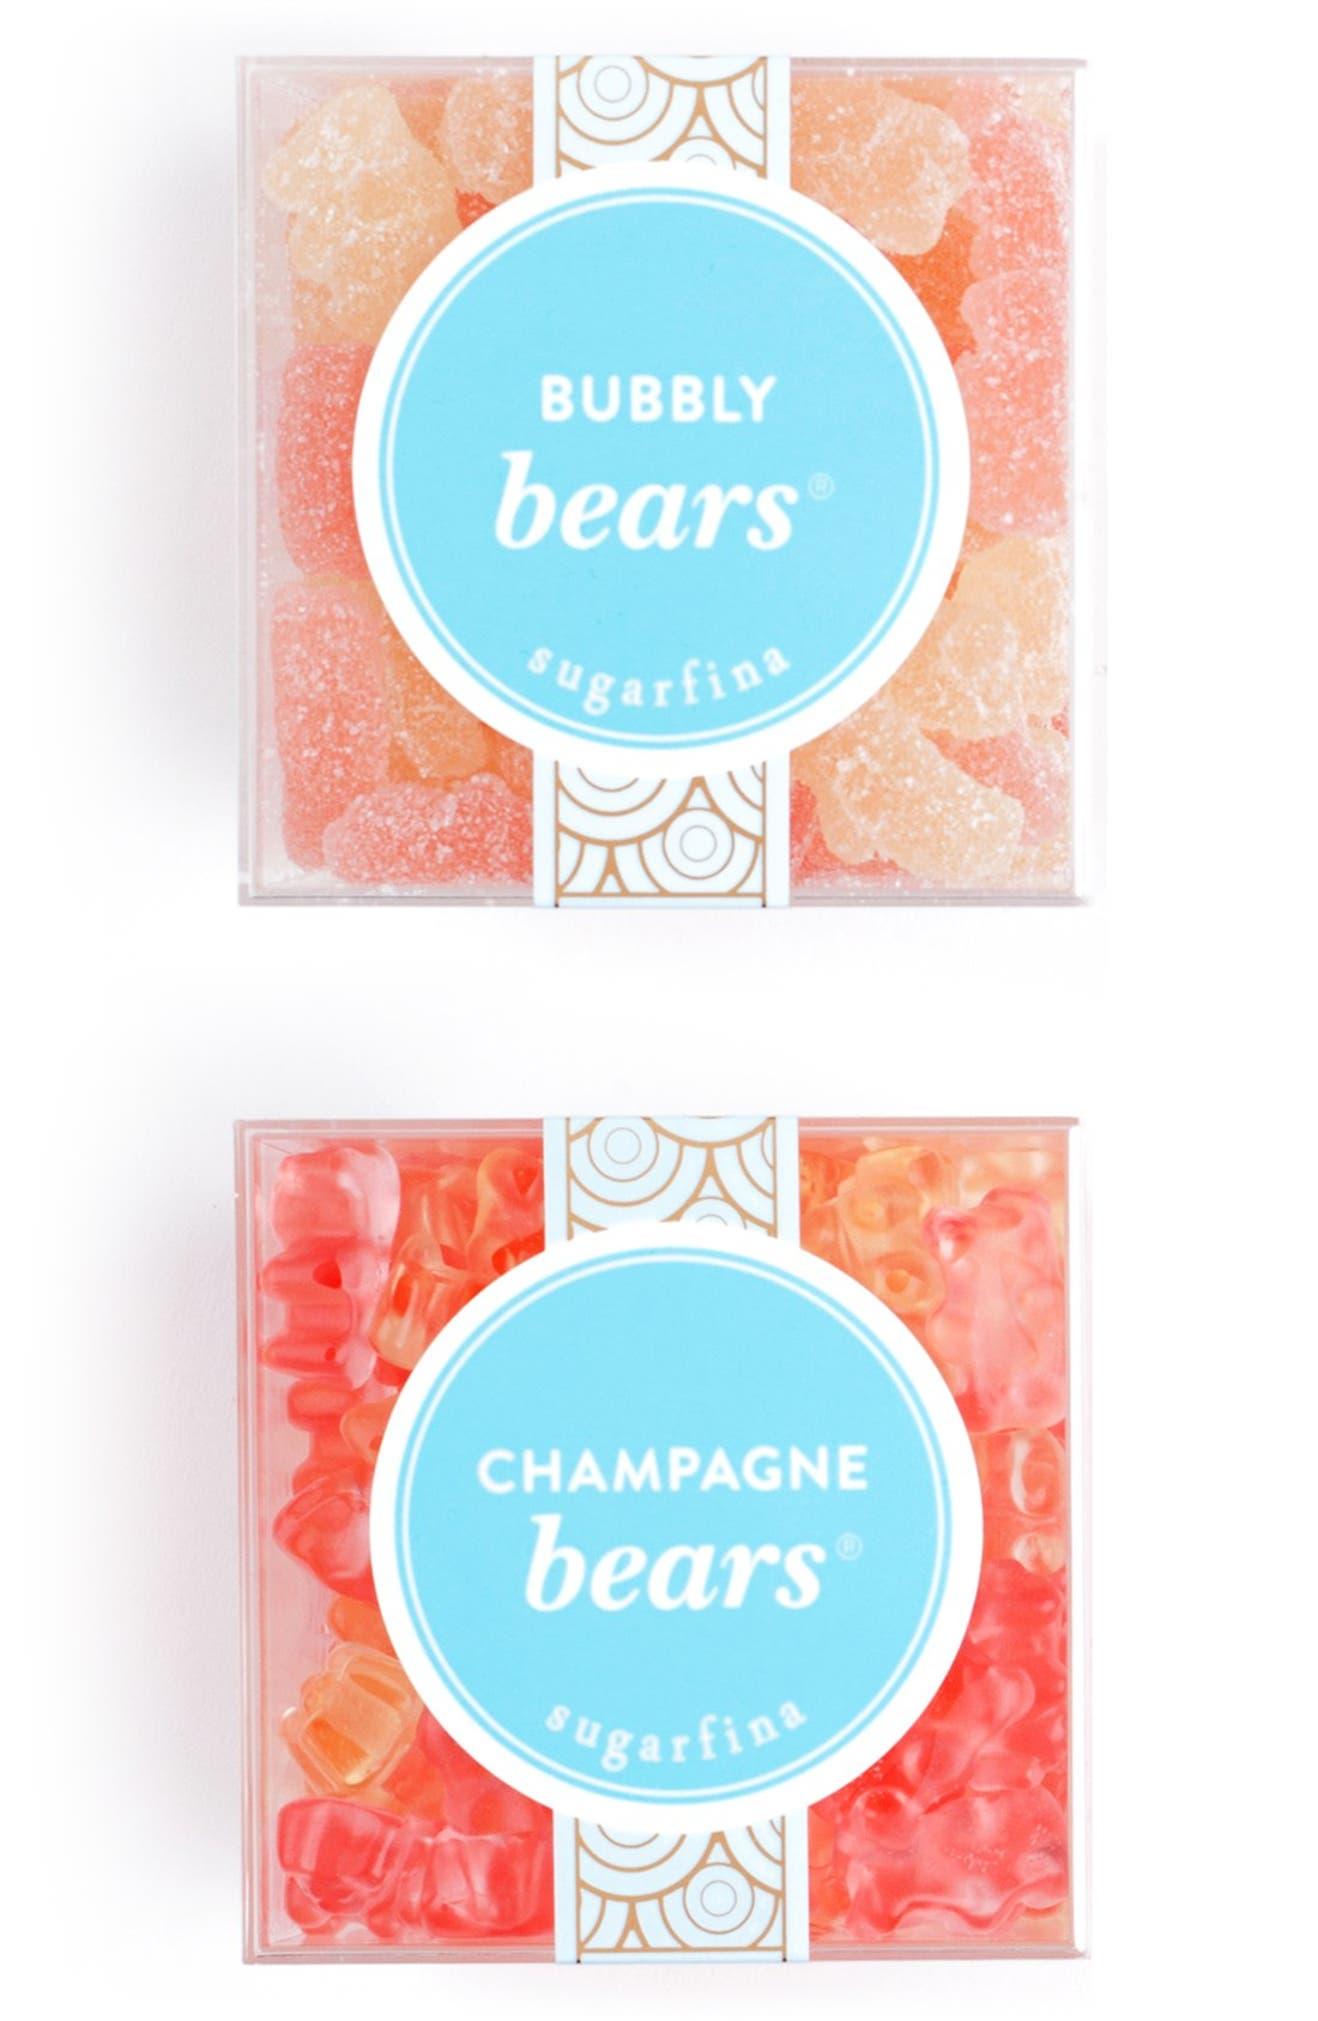 Sugarfina Champagne Bears Bubbly Bears Gift Box Set Nordstrom